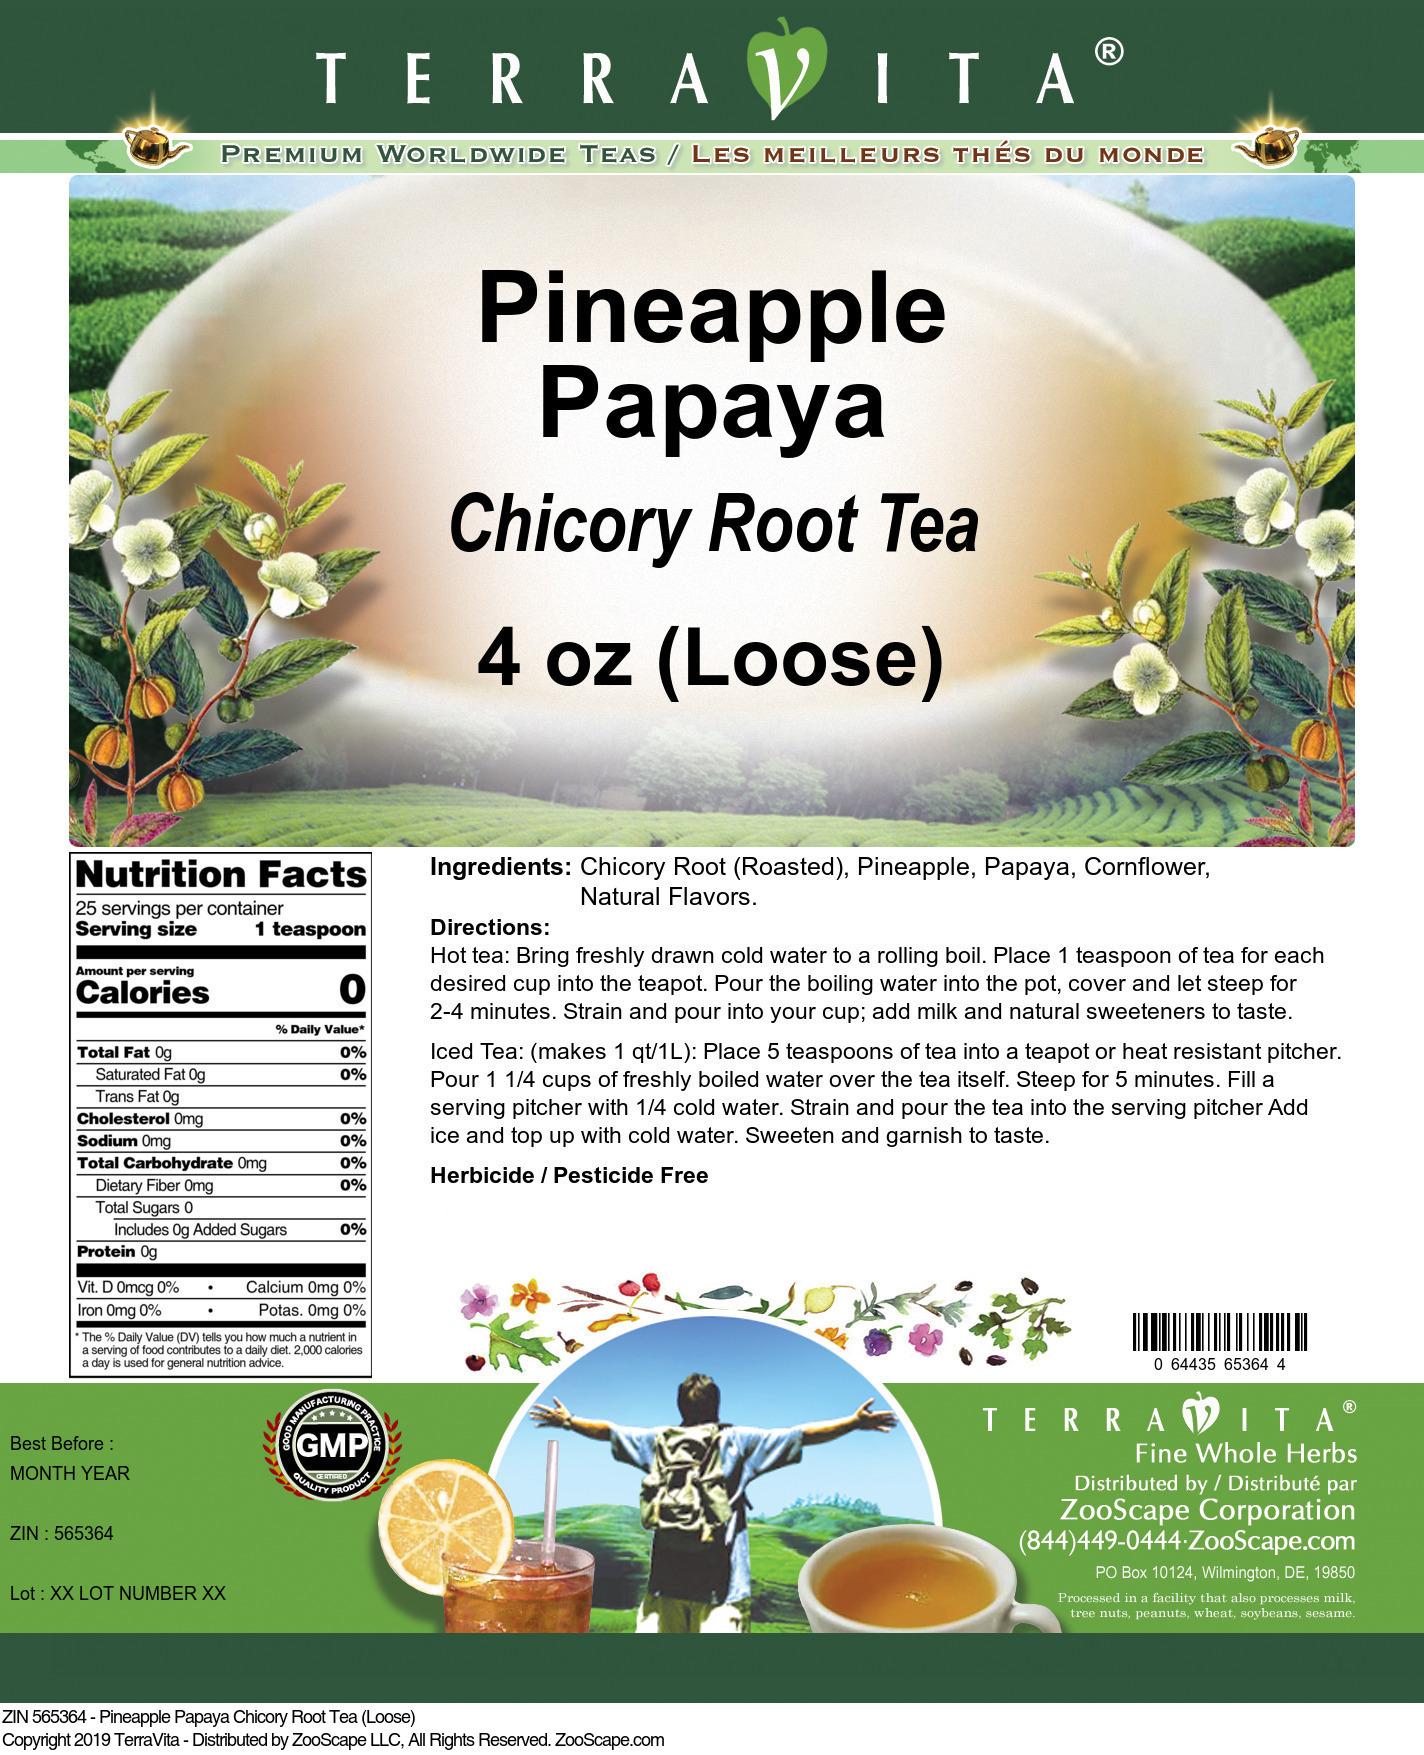 Pineapple Papaya Chicory Root Tea (Loose)